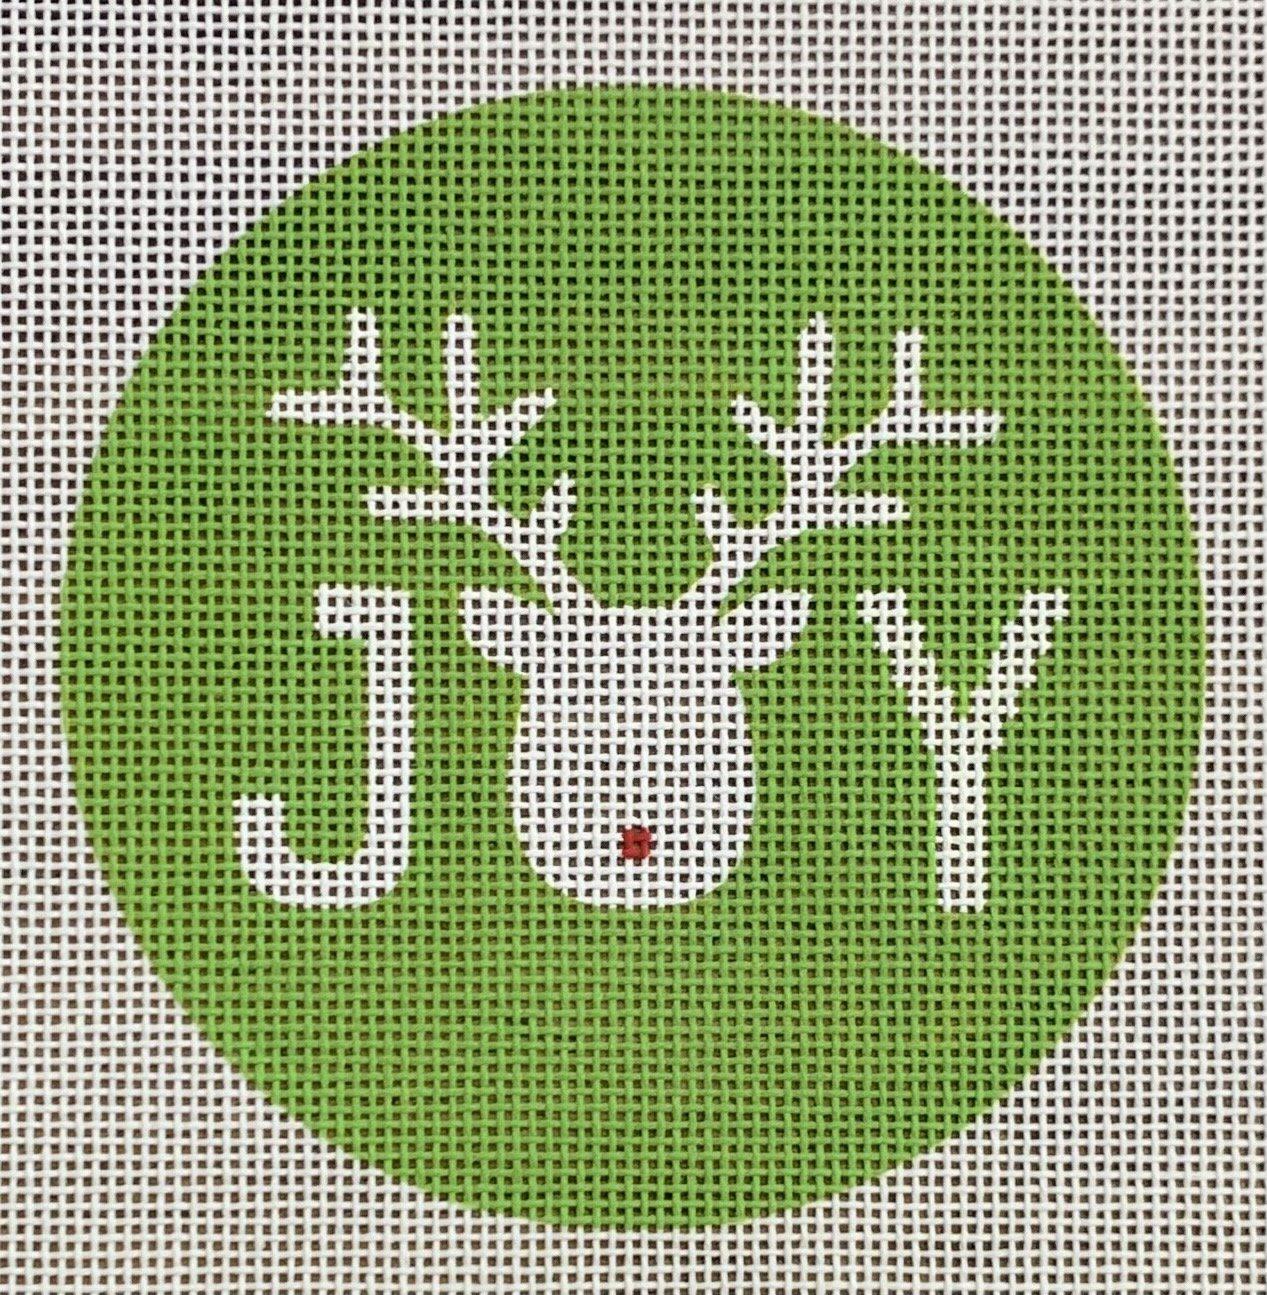 Reindeer Joy Ornament